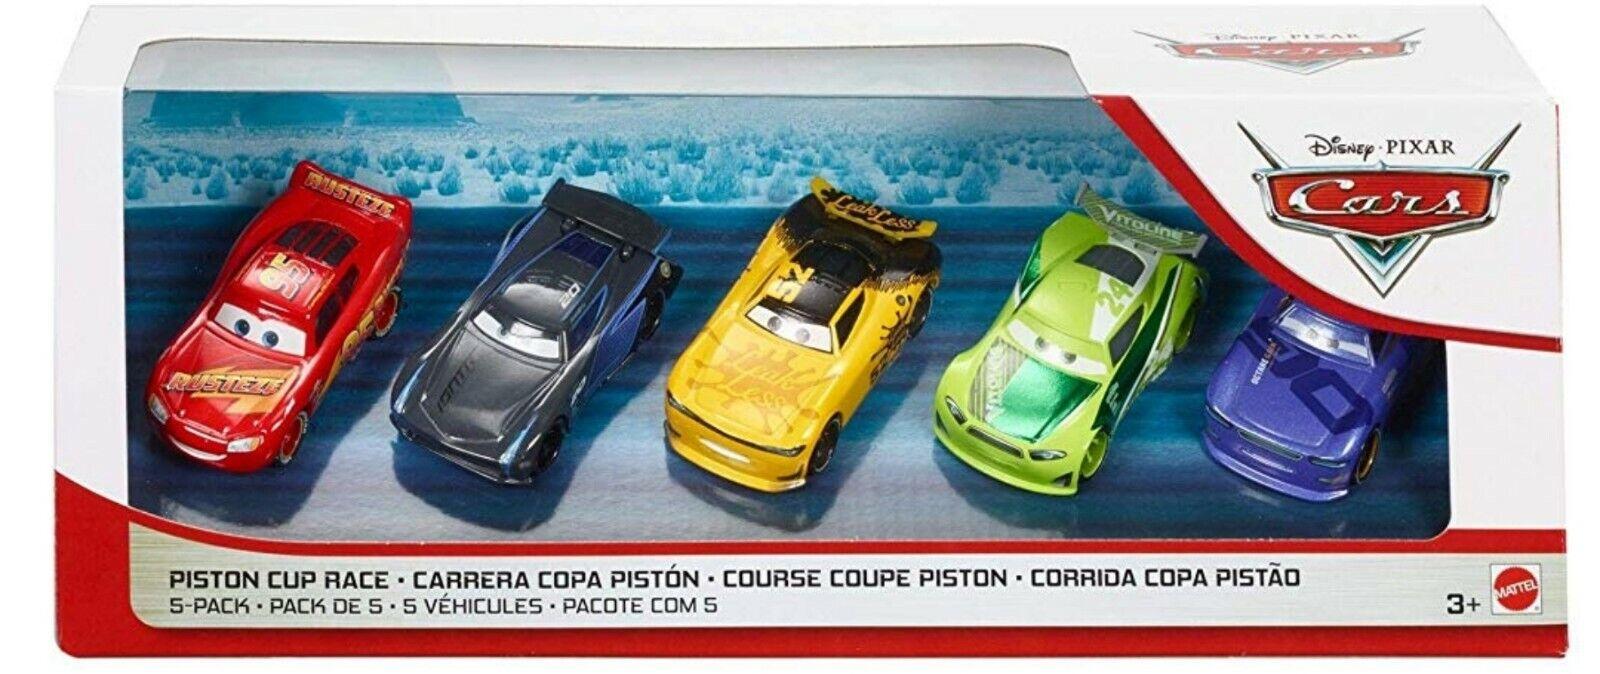 Disney Pixar Cars 3 Piston Cup Race 5 Pack Leak Less Chase Jackson